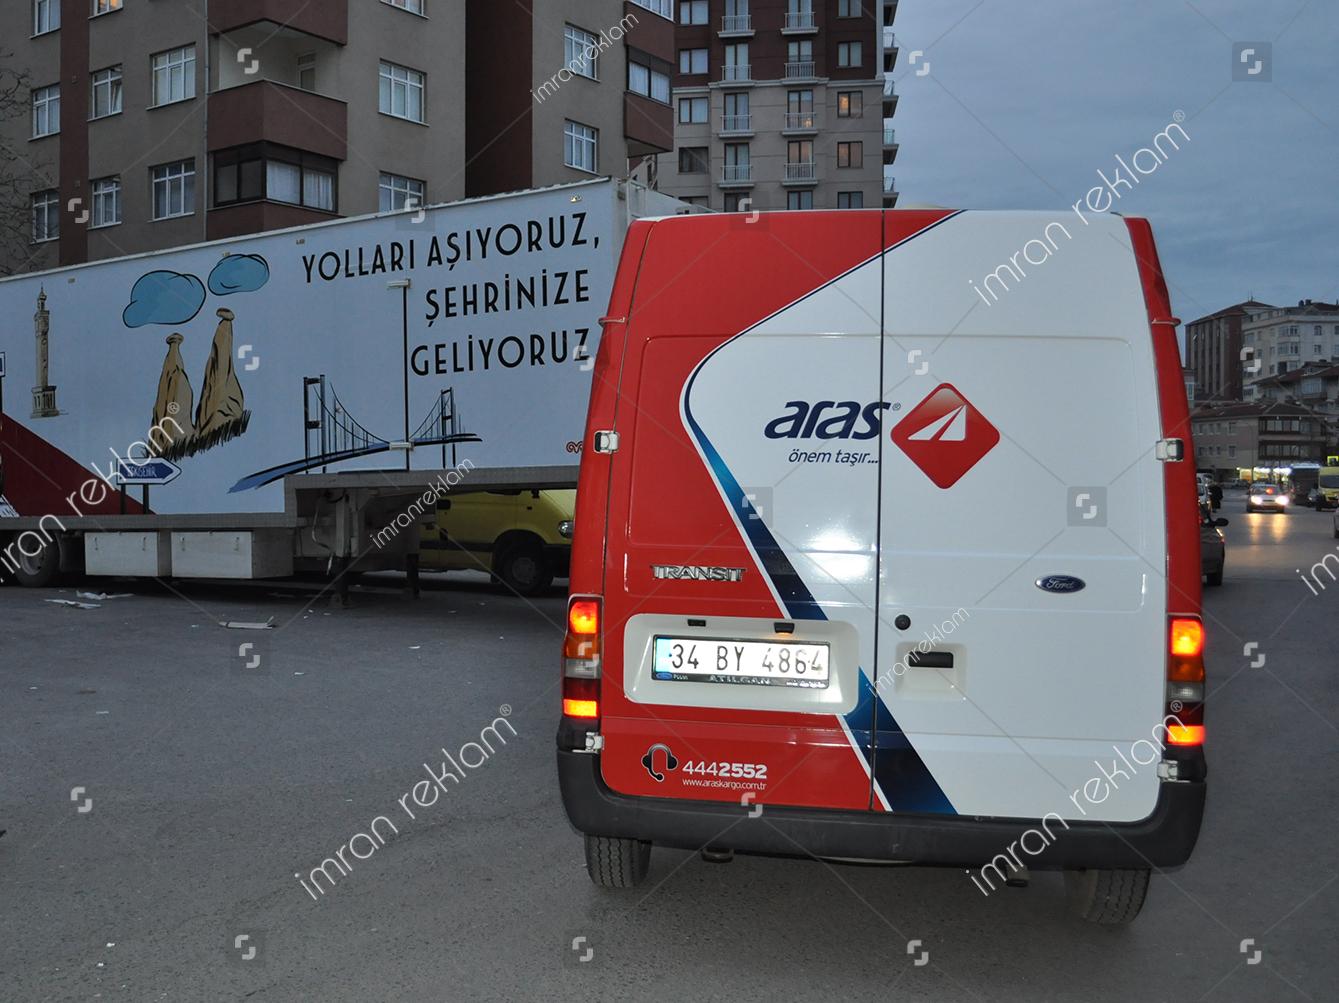 arac-giydirme-reklamlari-arac-kaplama-aras-kargo-ford-transit